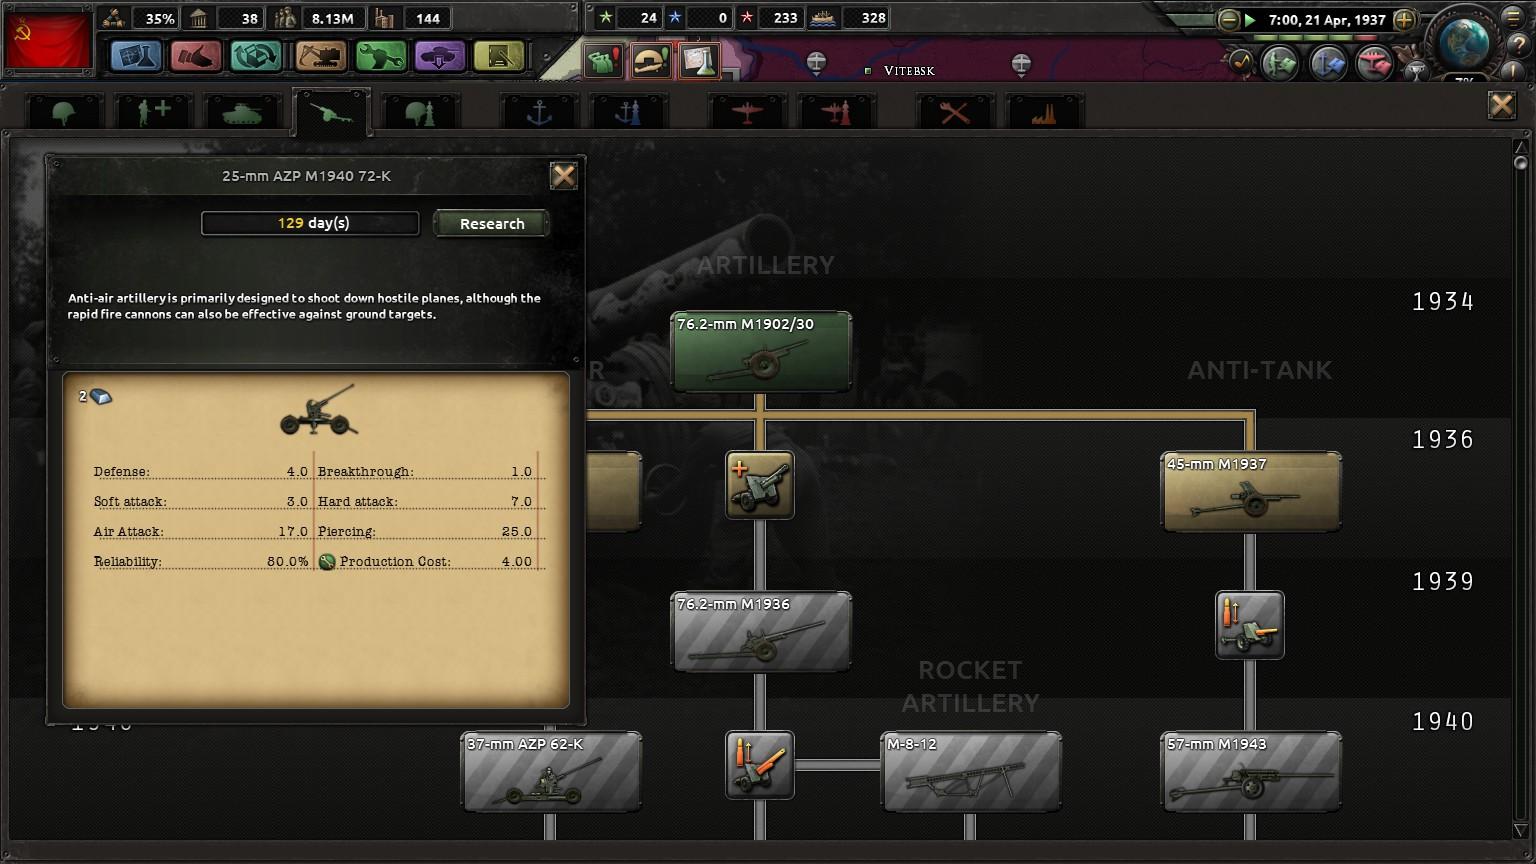 Steam Community :: Guide :: Astec's School of Mass Combat - Soviet